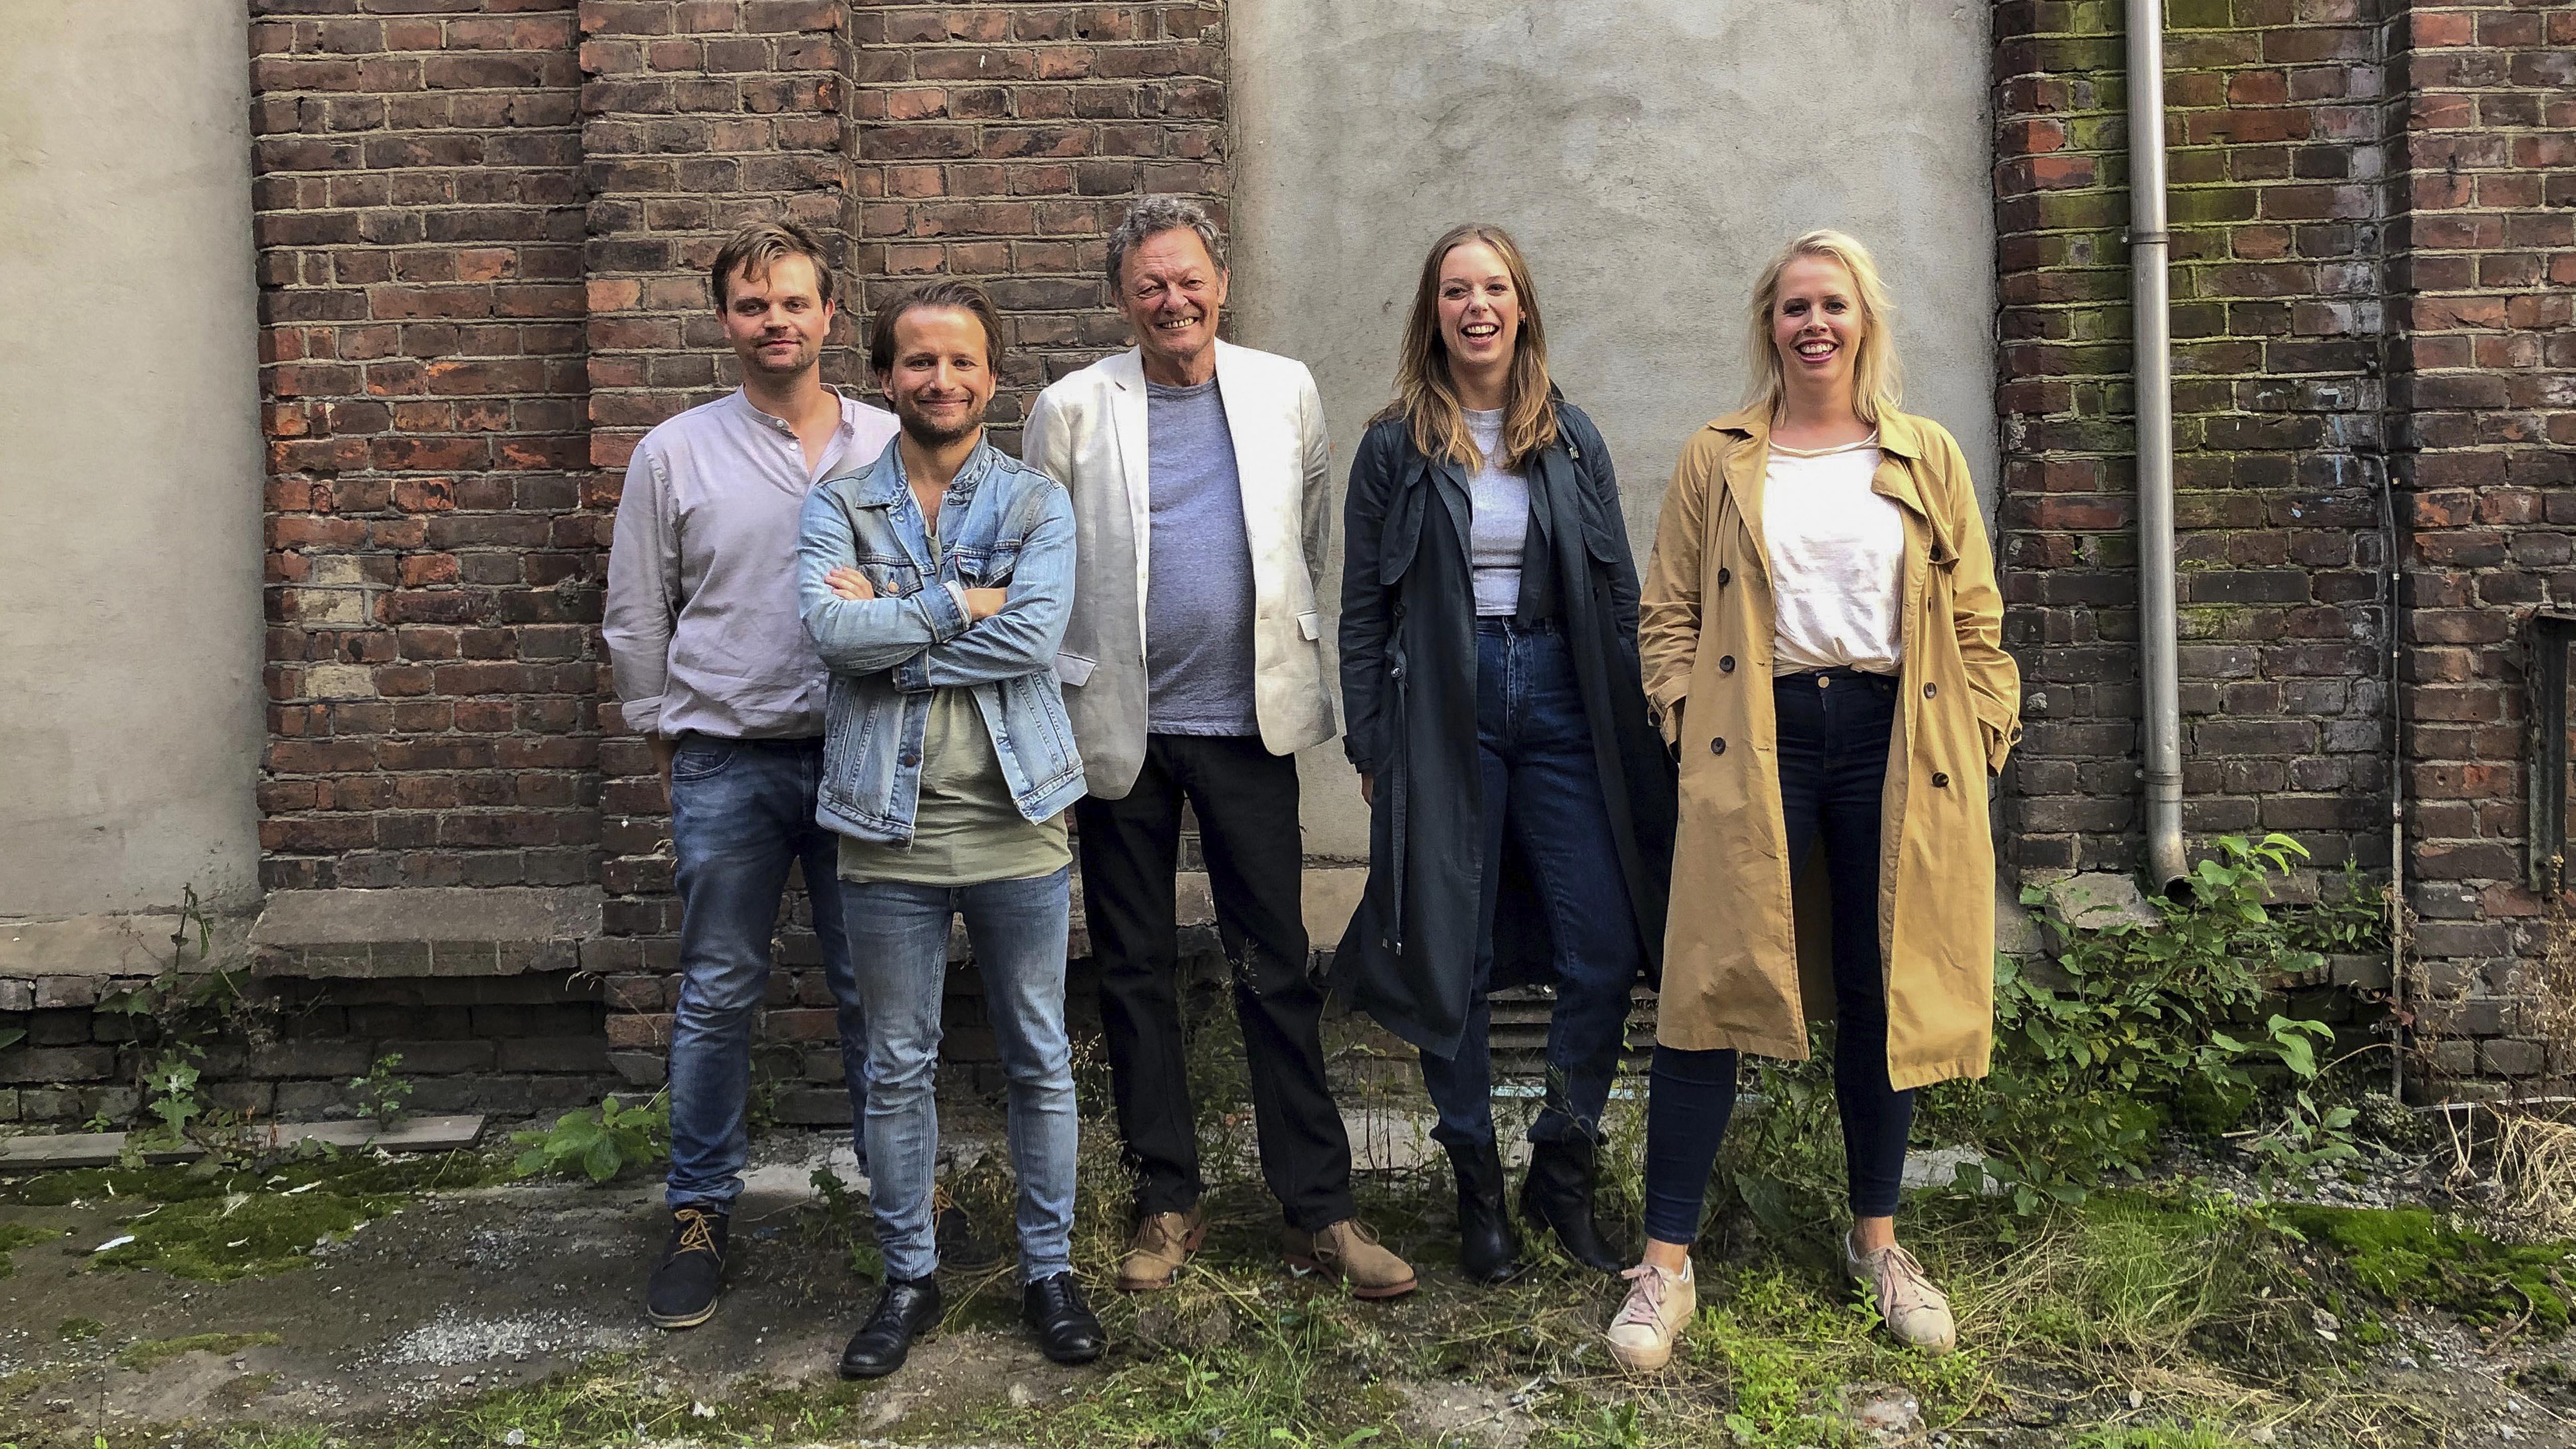 En gruppe skuespillere